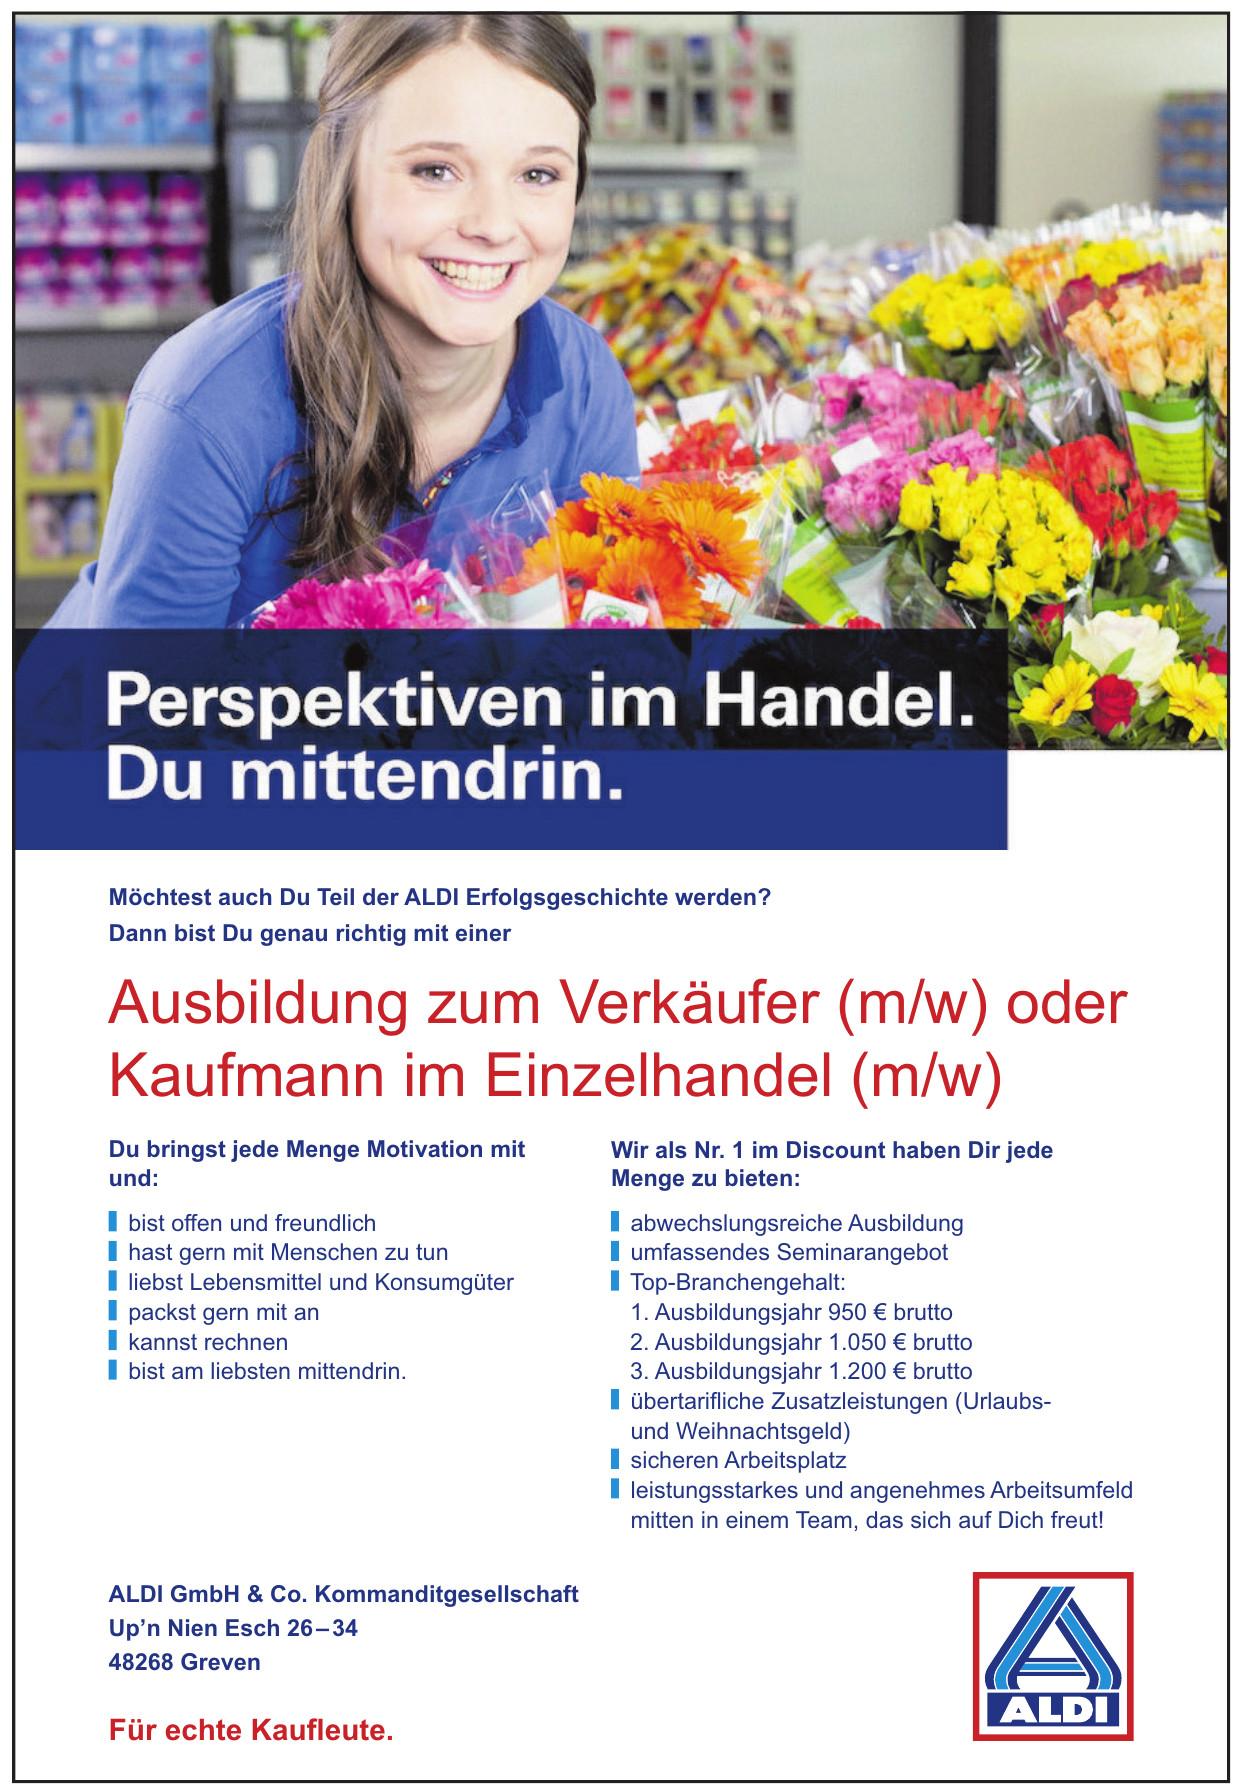 ALDI GmbH & Co. Kommanditgesellschaft